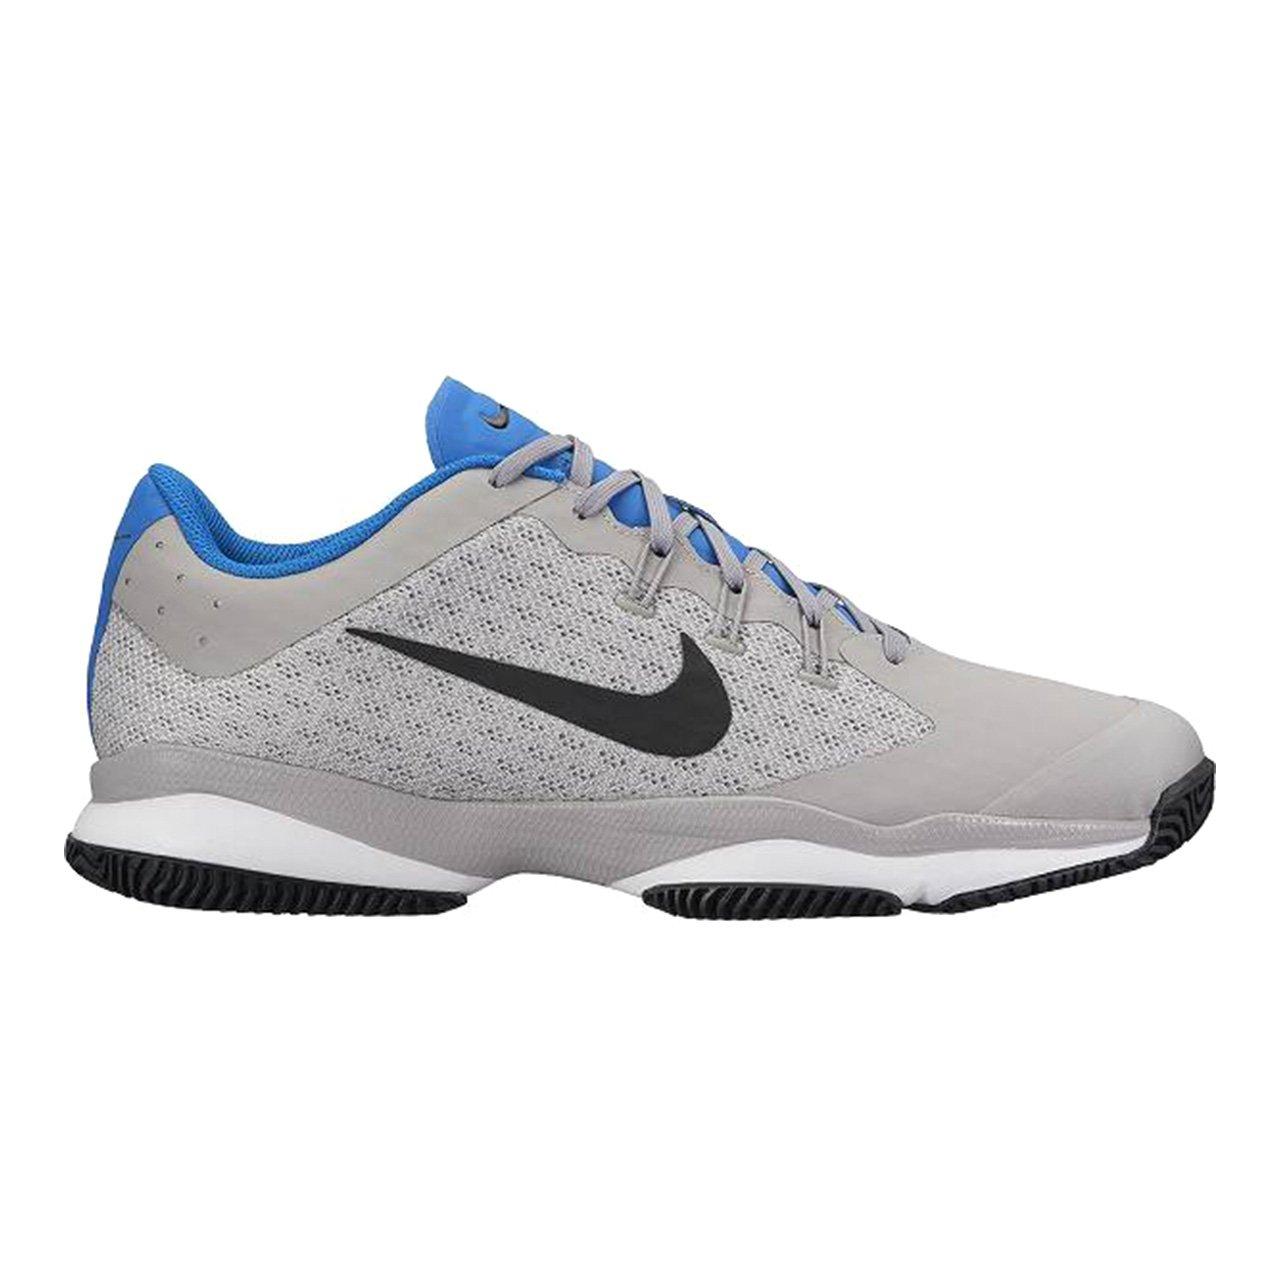 83a2a341e39aa Galleon - Nike Men s Air Zoom Ultra Tennis Shoes (7 D US